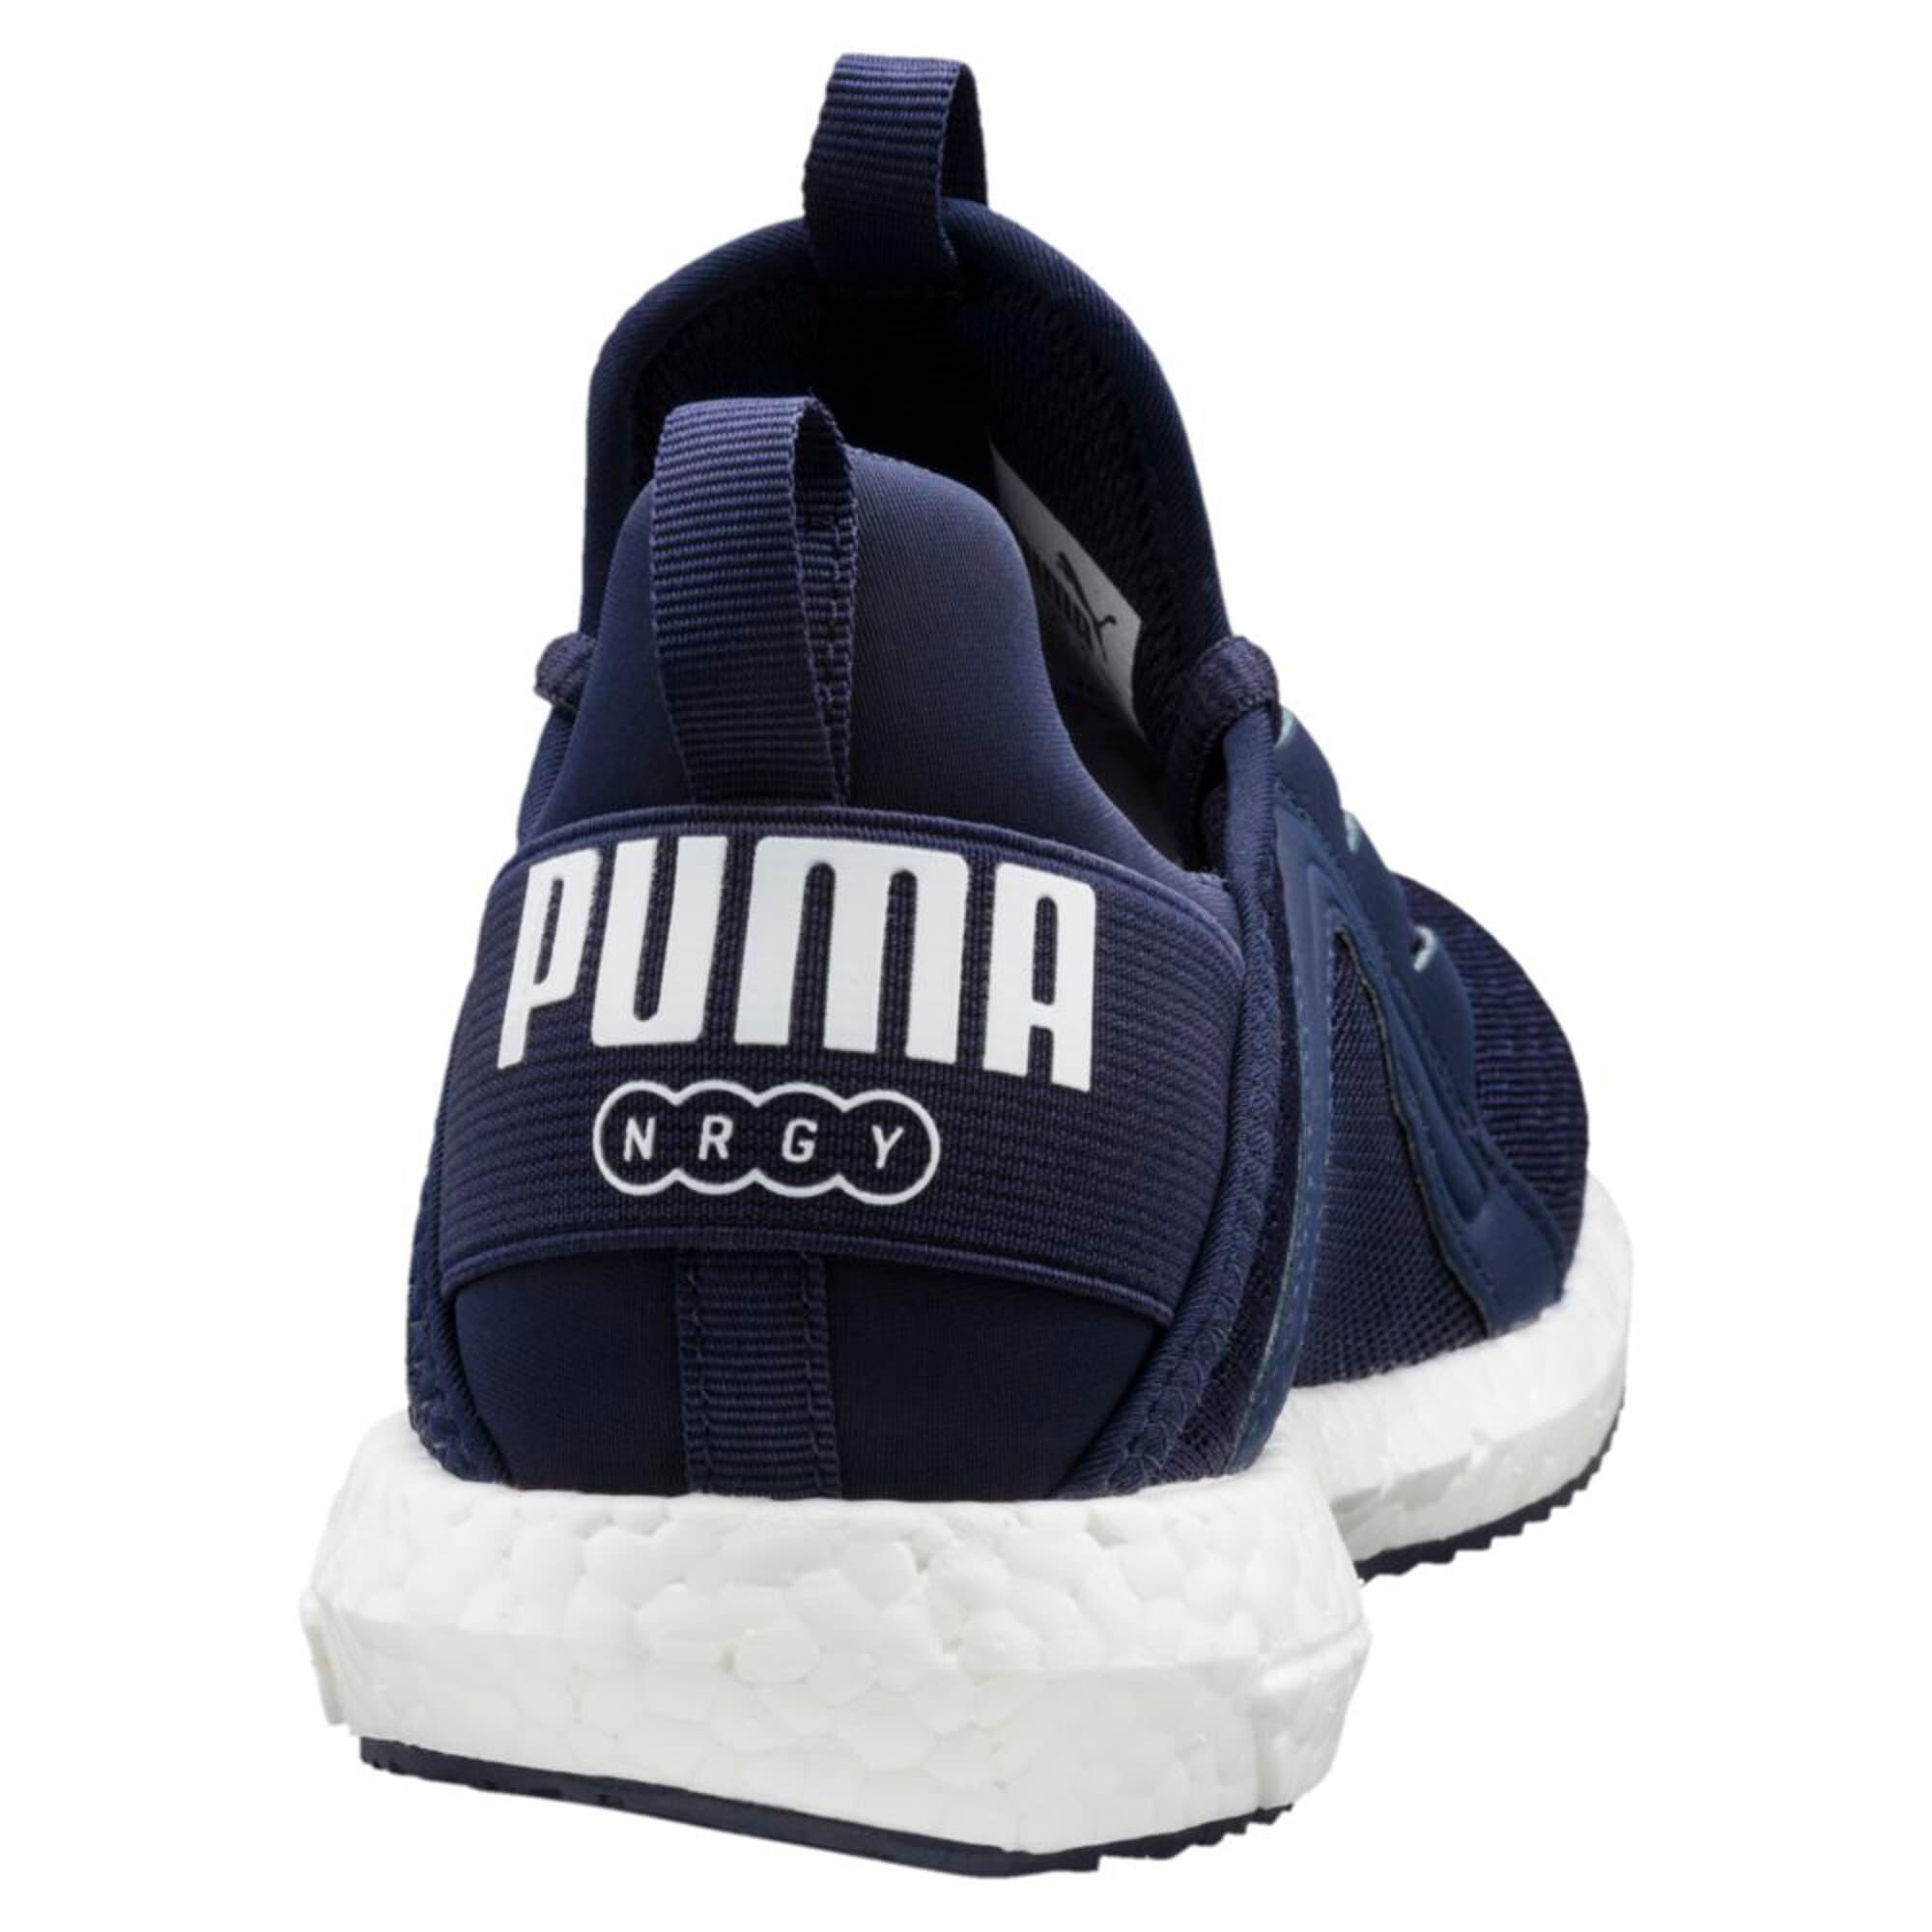 Thumbnail 2 of Mega NRGY Jr Trainers, Peacoat-Puma White, medium-IND